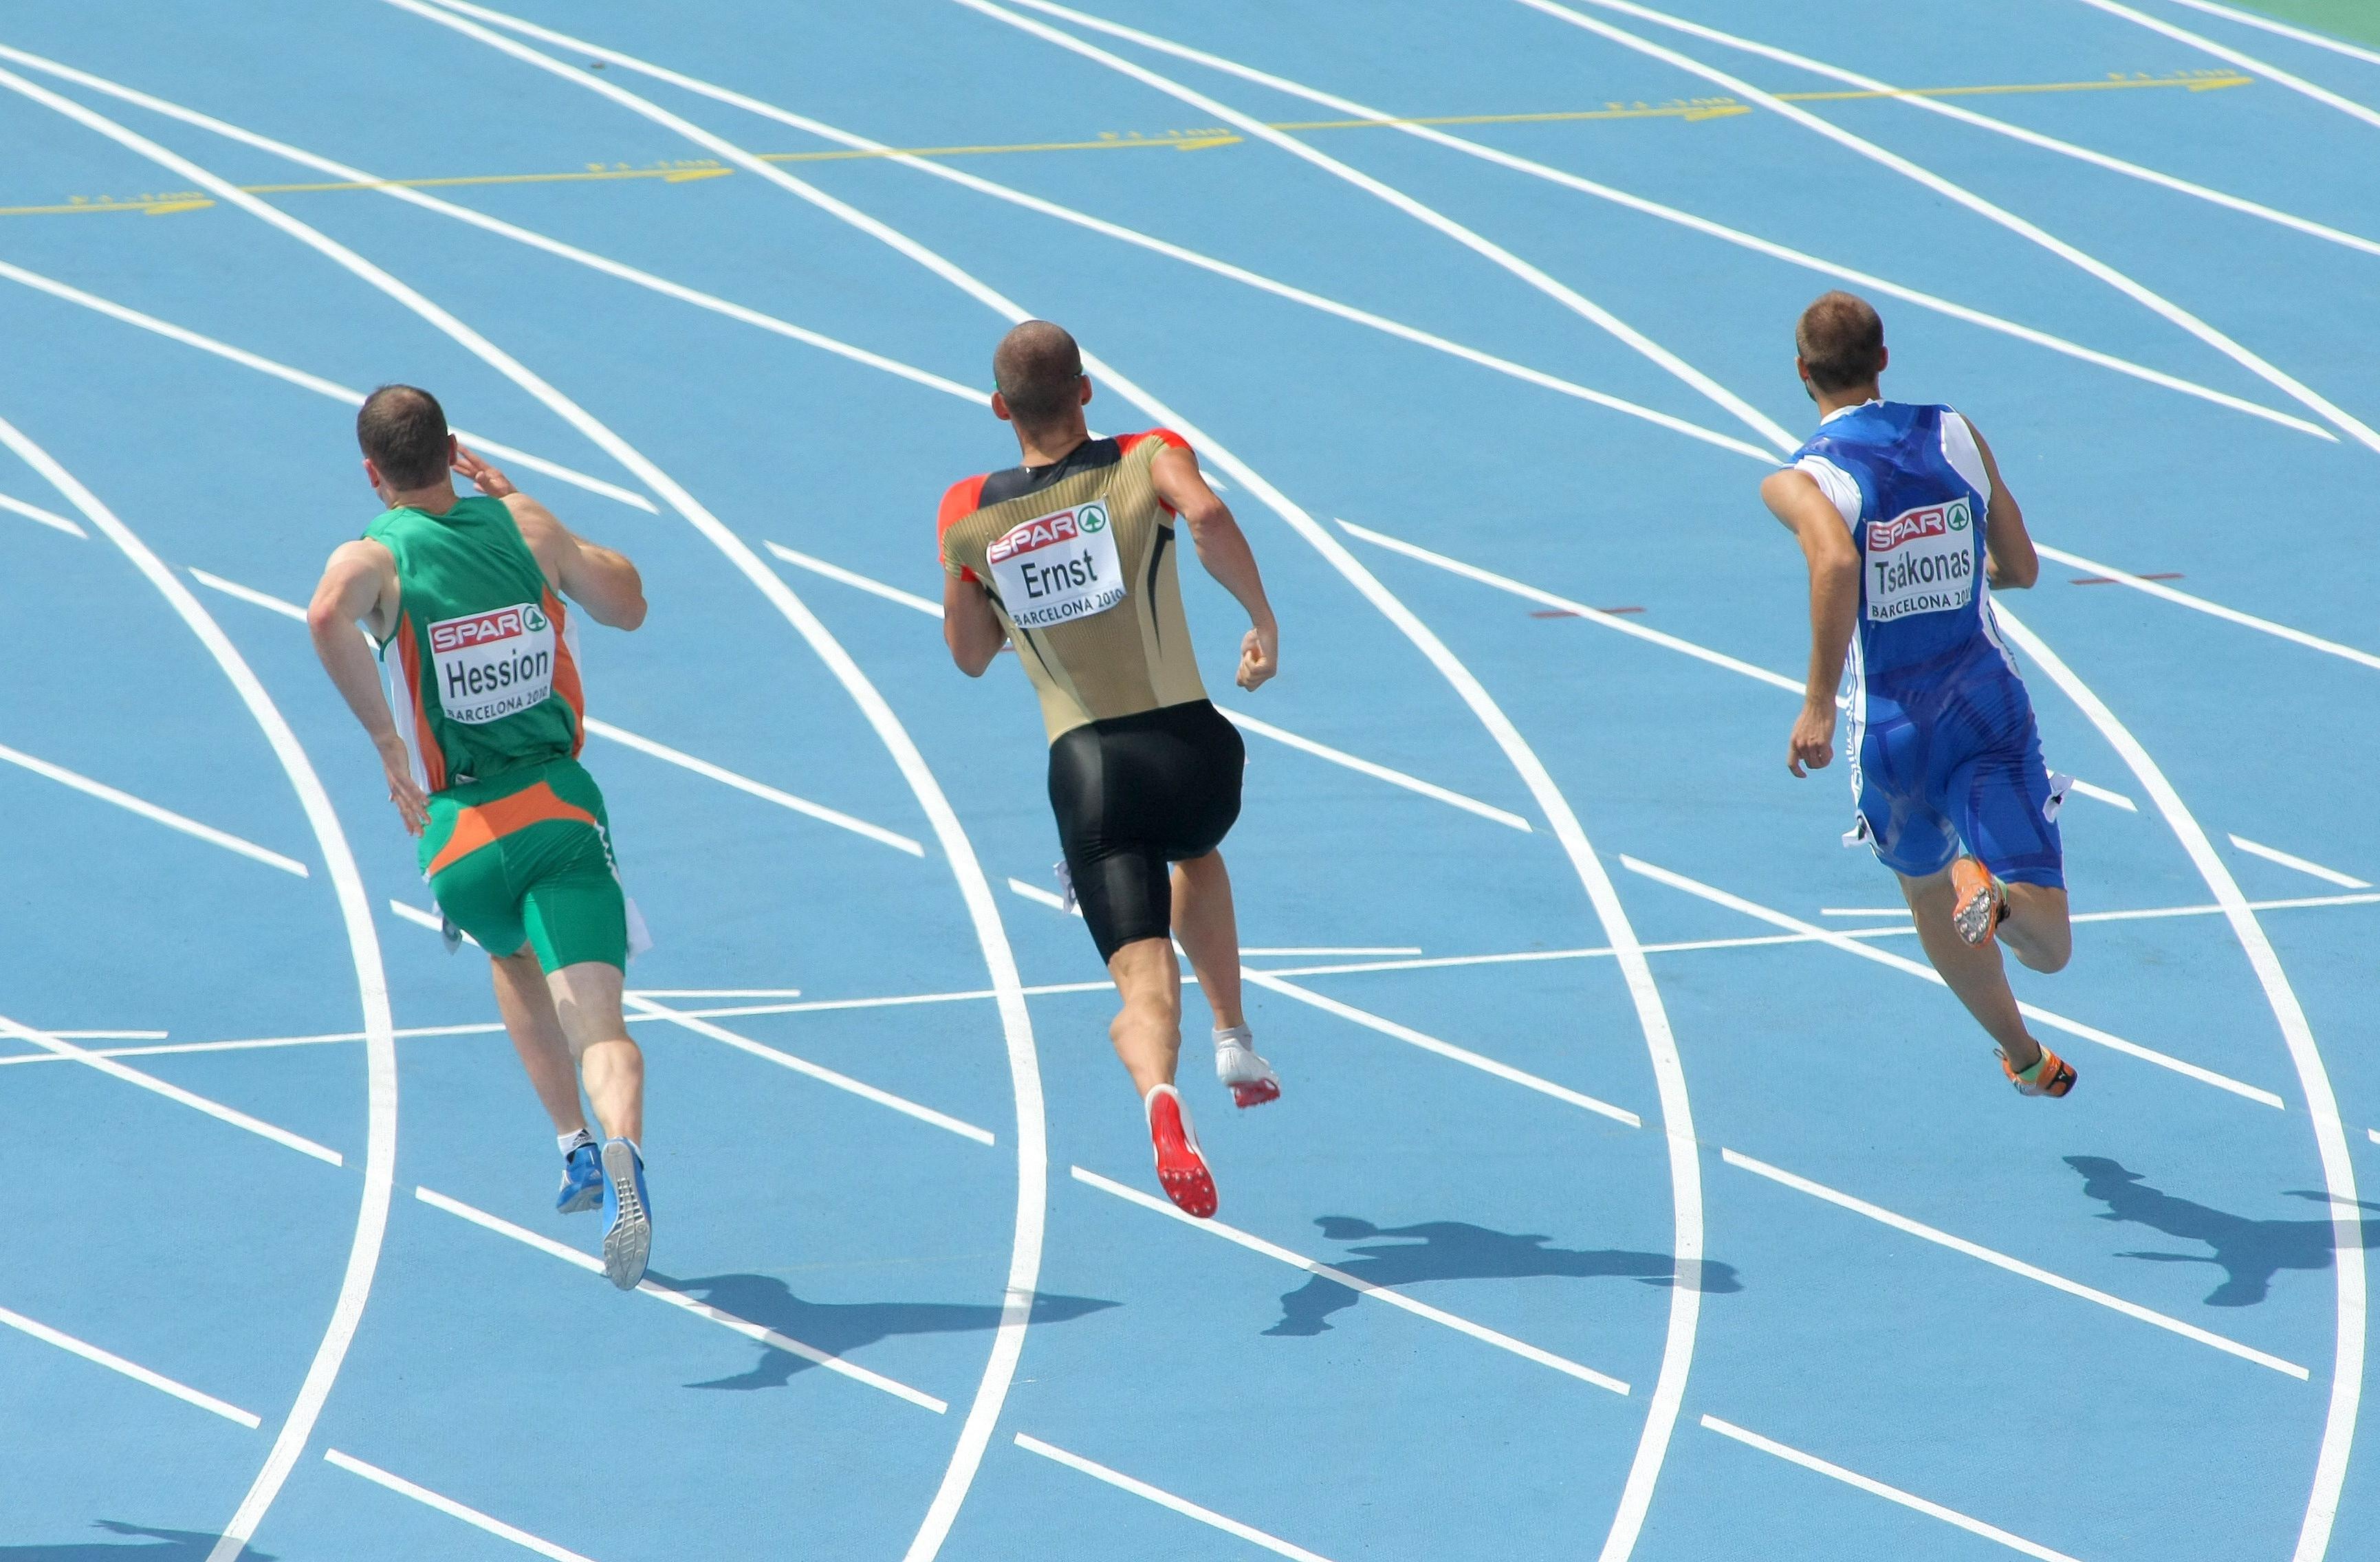 Wallpaper : Runners, Track, Back, Running 3461x2272